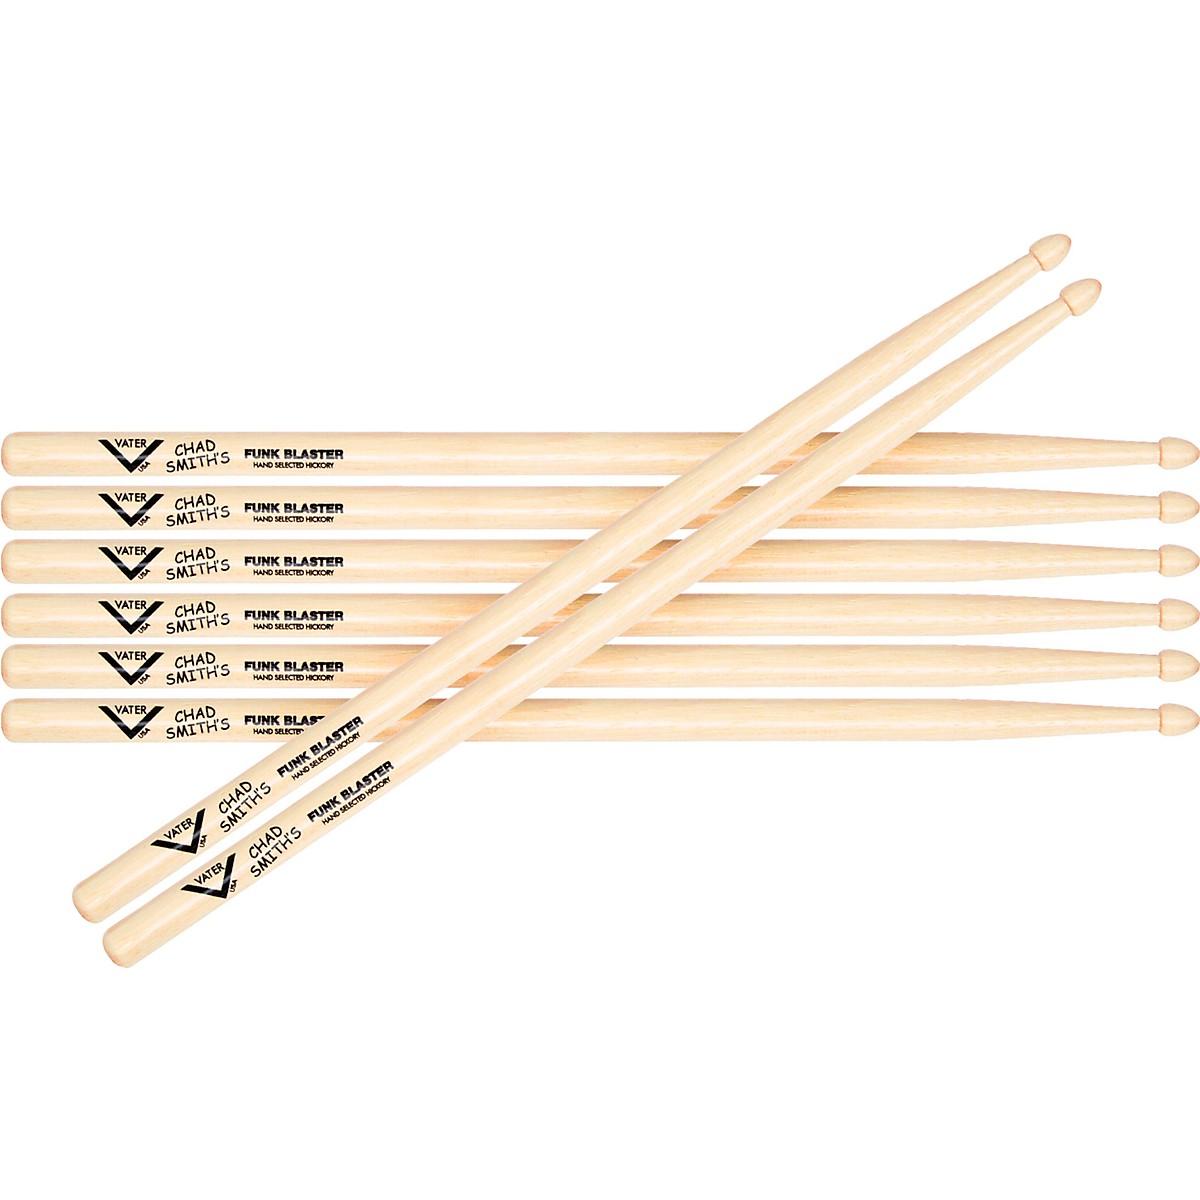 Vater Chad Smith Signature Funk Blaster Drumsicks - Buy 3, Get 1 Free